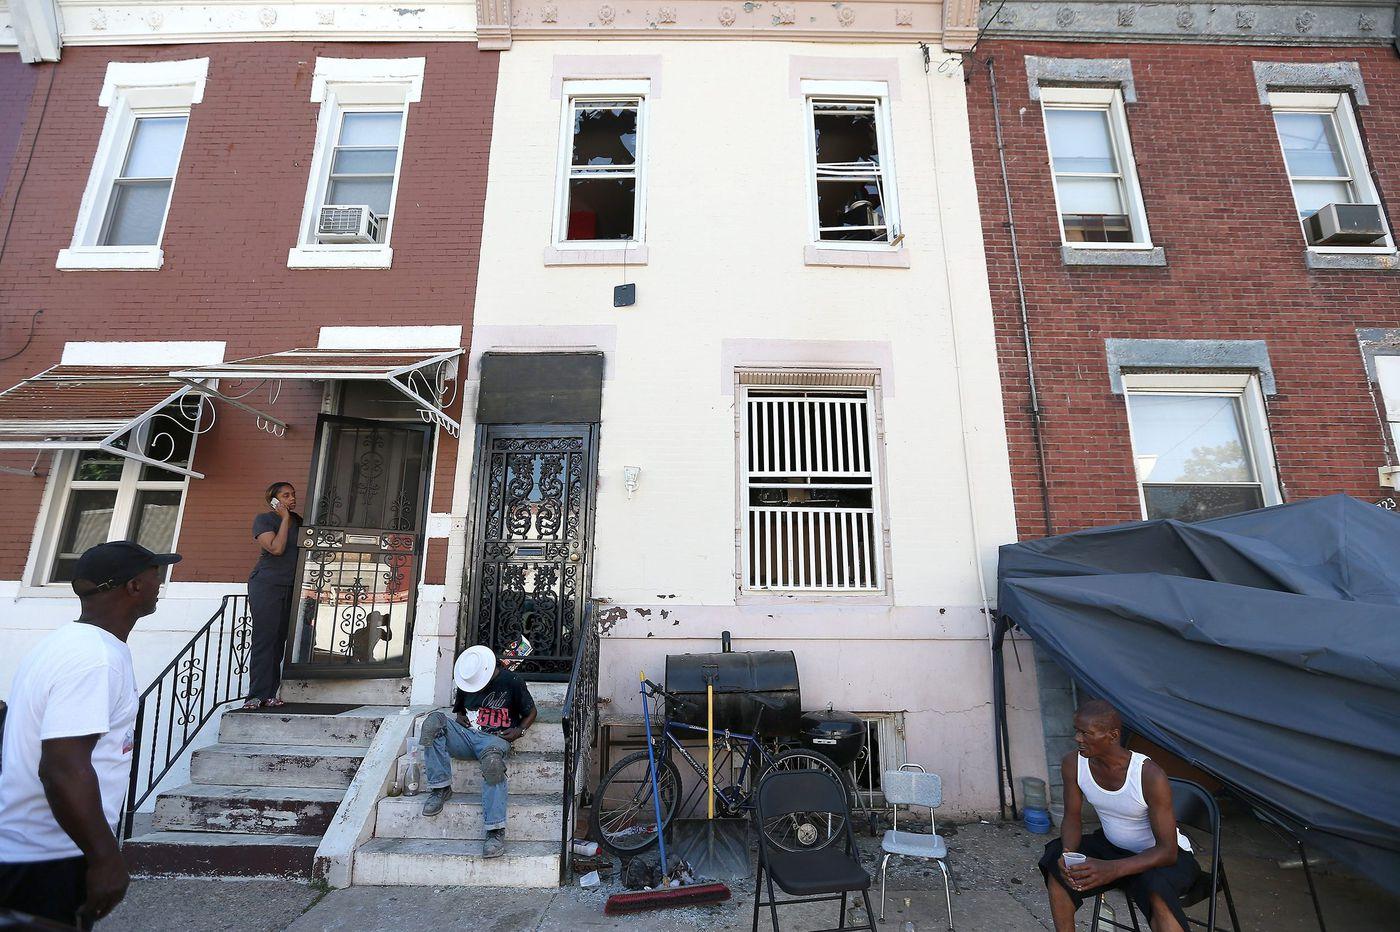 2 dead in North Philadelphia house fire